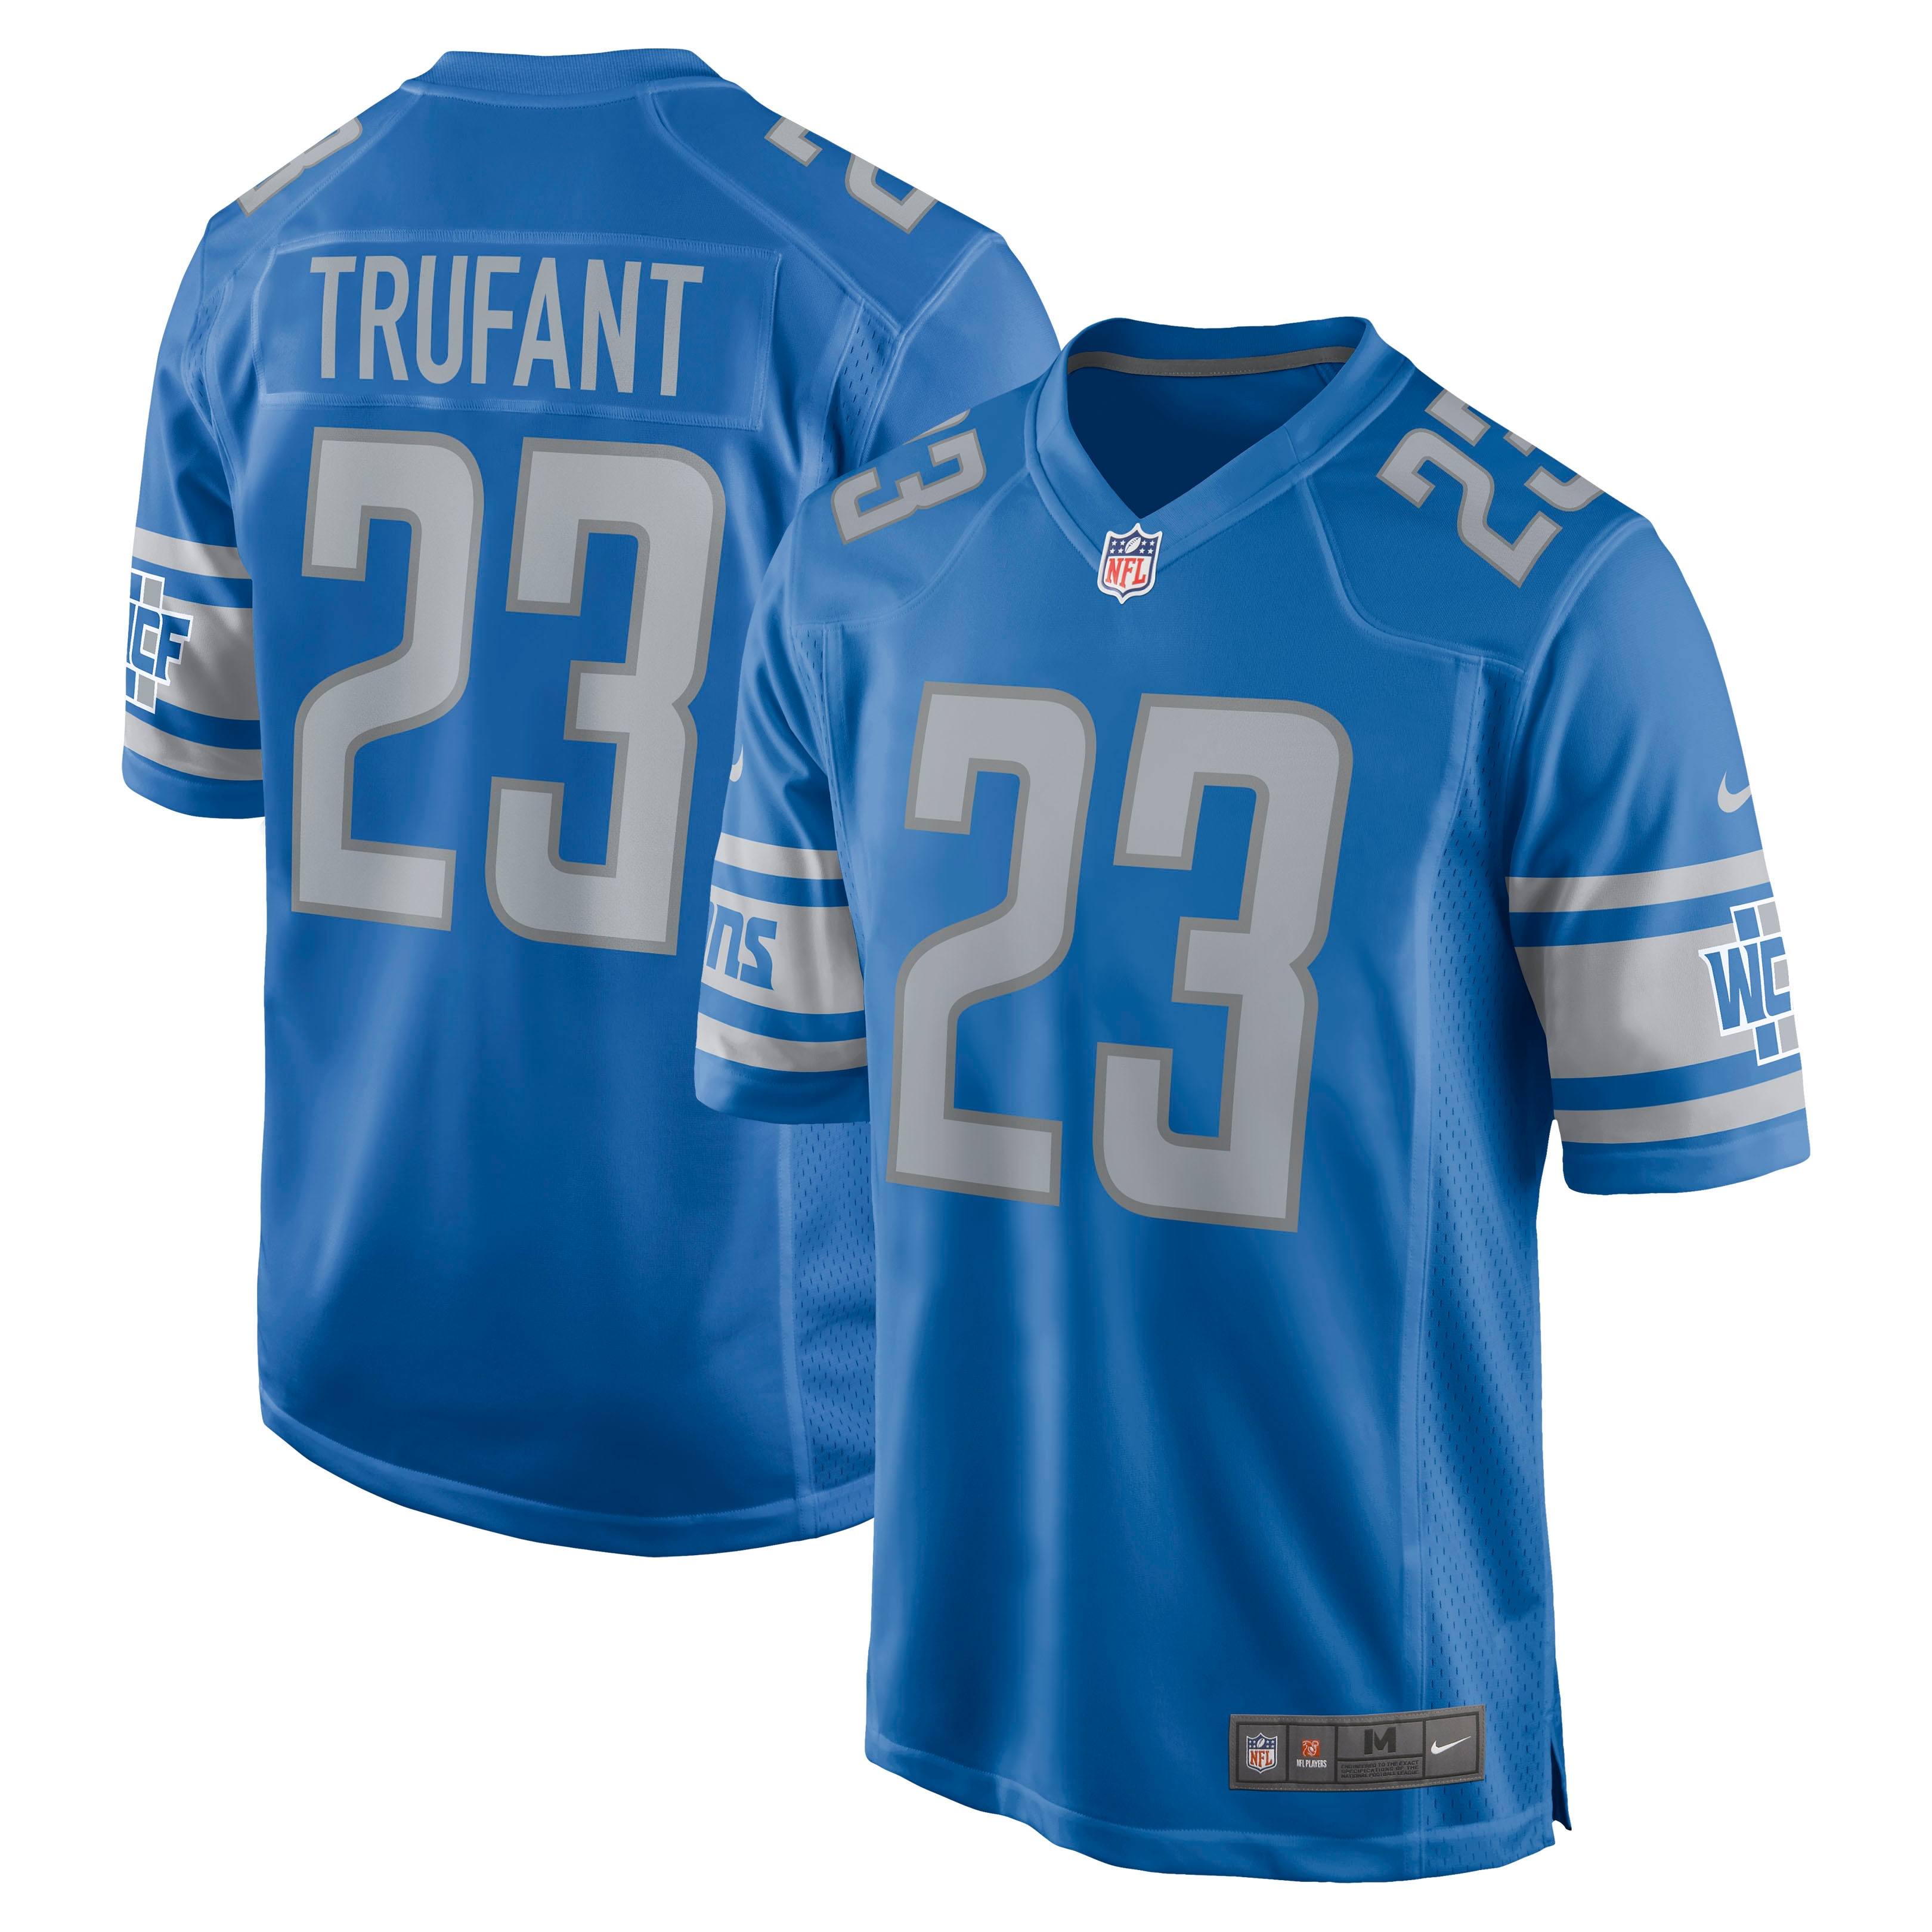 Desmond Trufant Detroit Lions Nike Game Jersey - Blue - Walmart.com